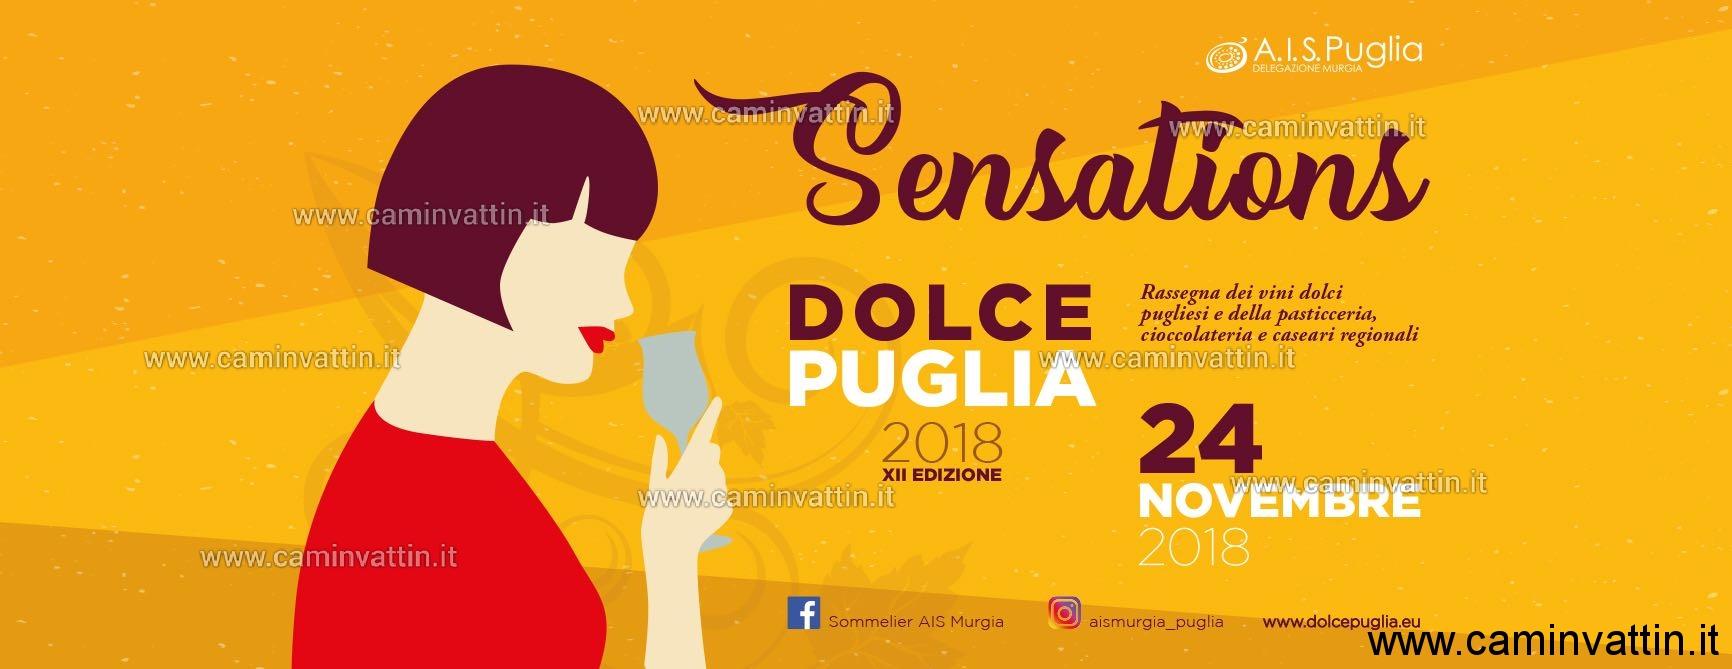 DOLCE Puglia 2018 Sensations